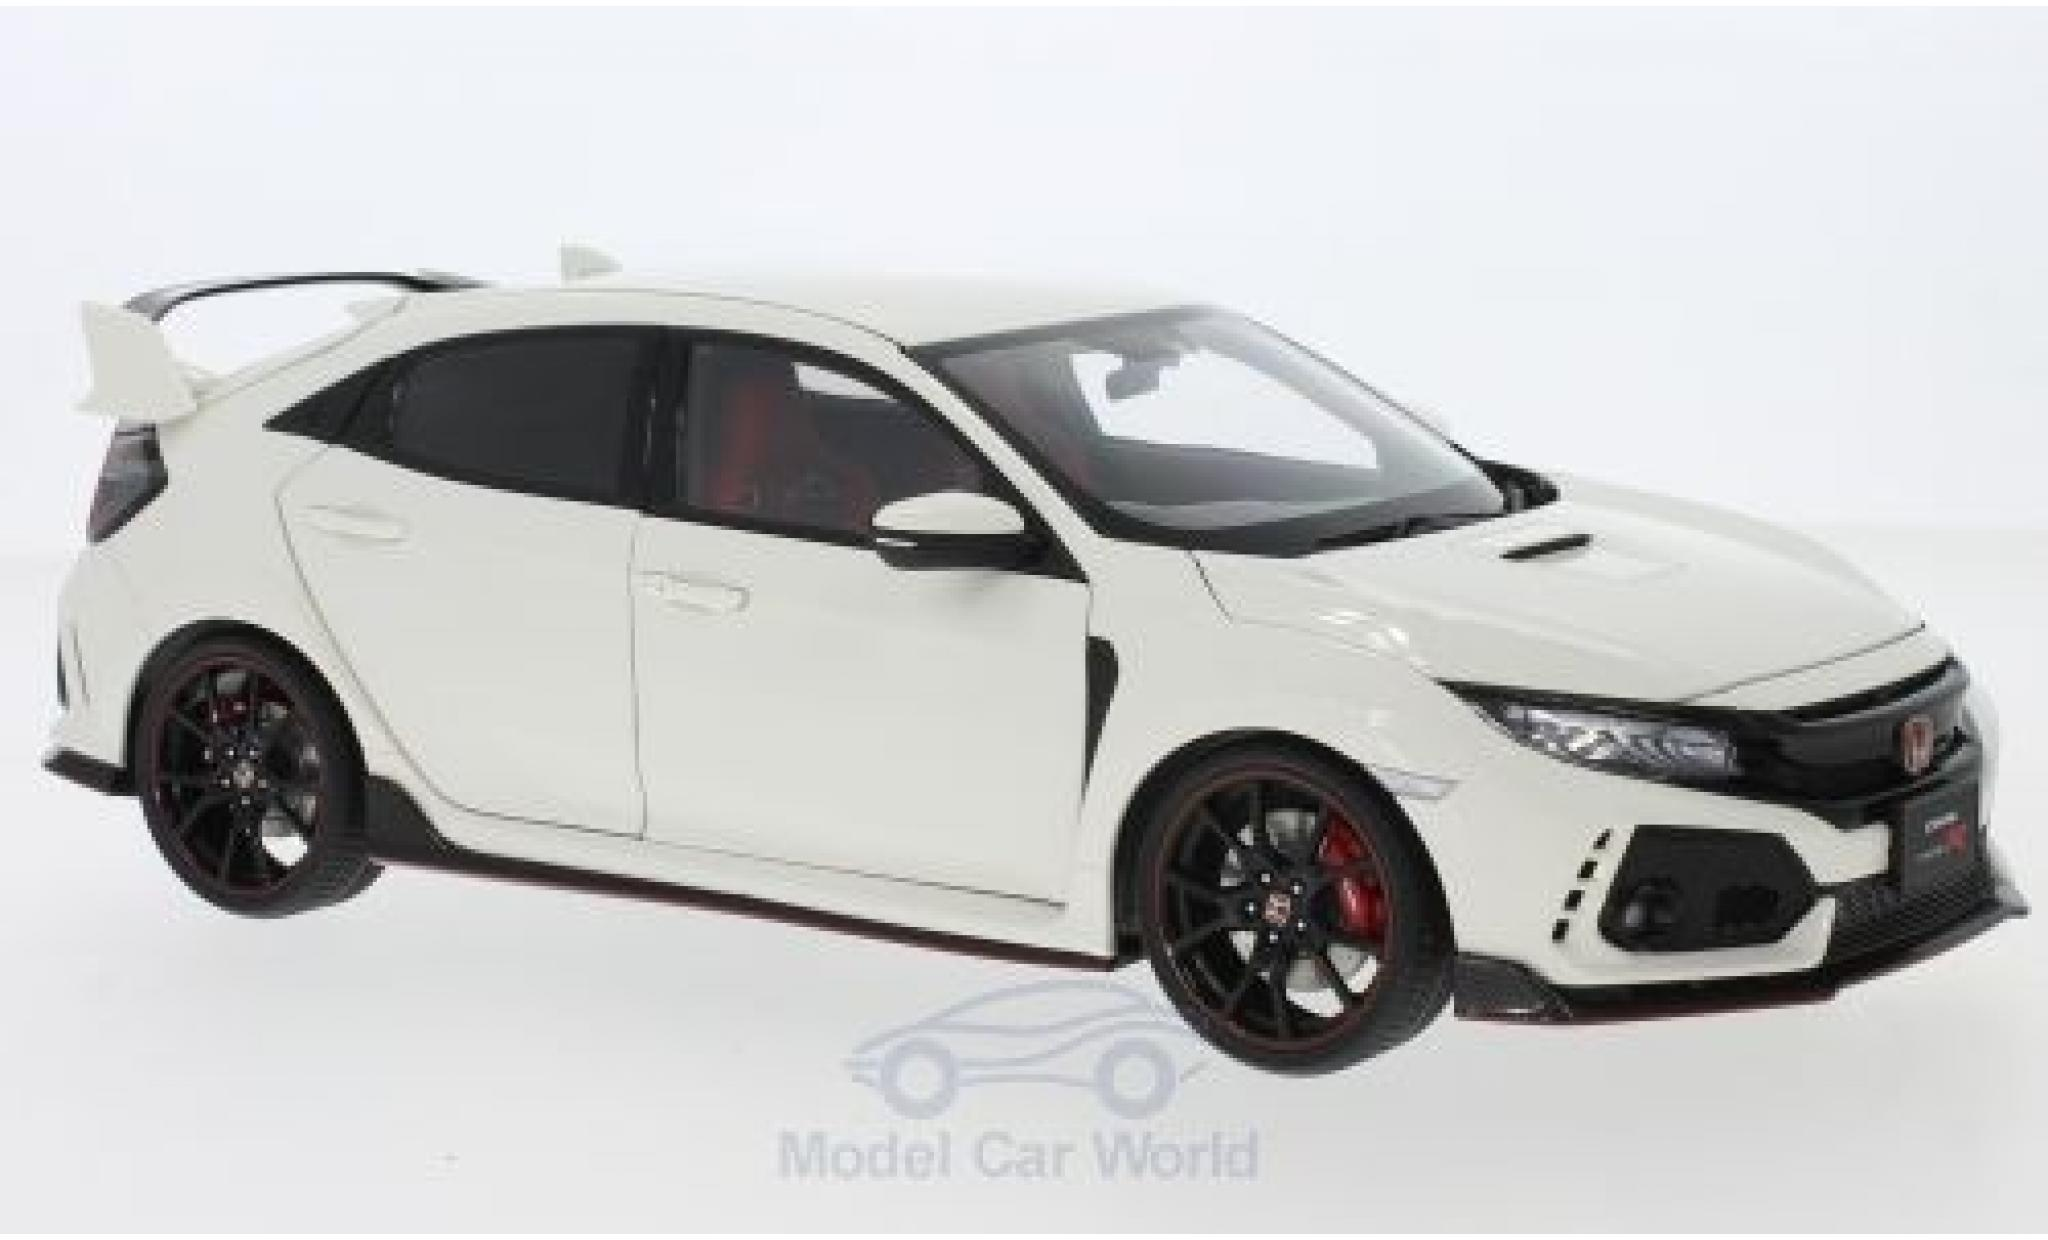 Honda Civic 1/18 AUTOart Type R (FK8) blanche RHD 2017